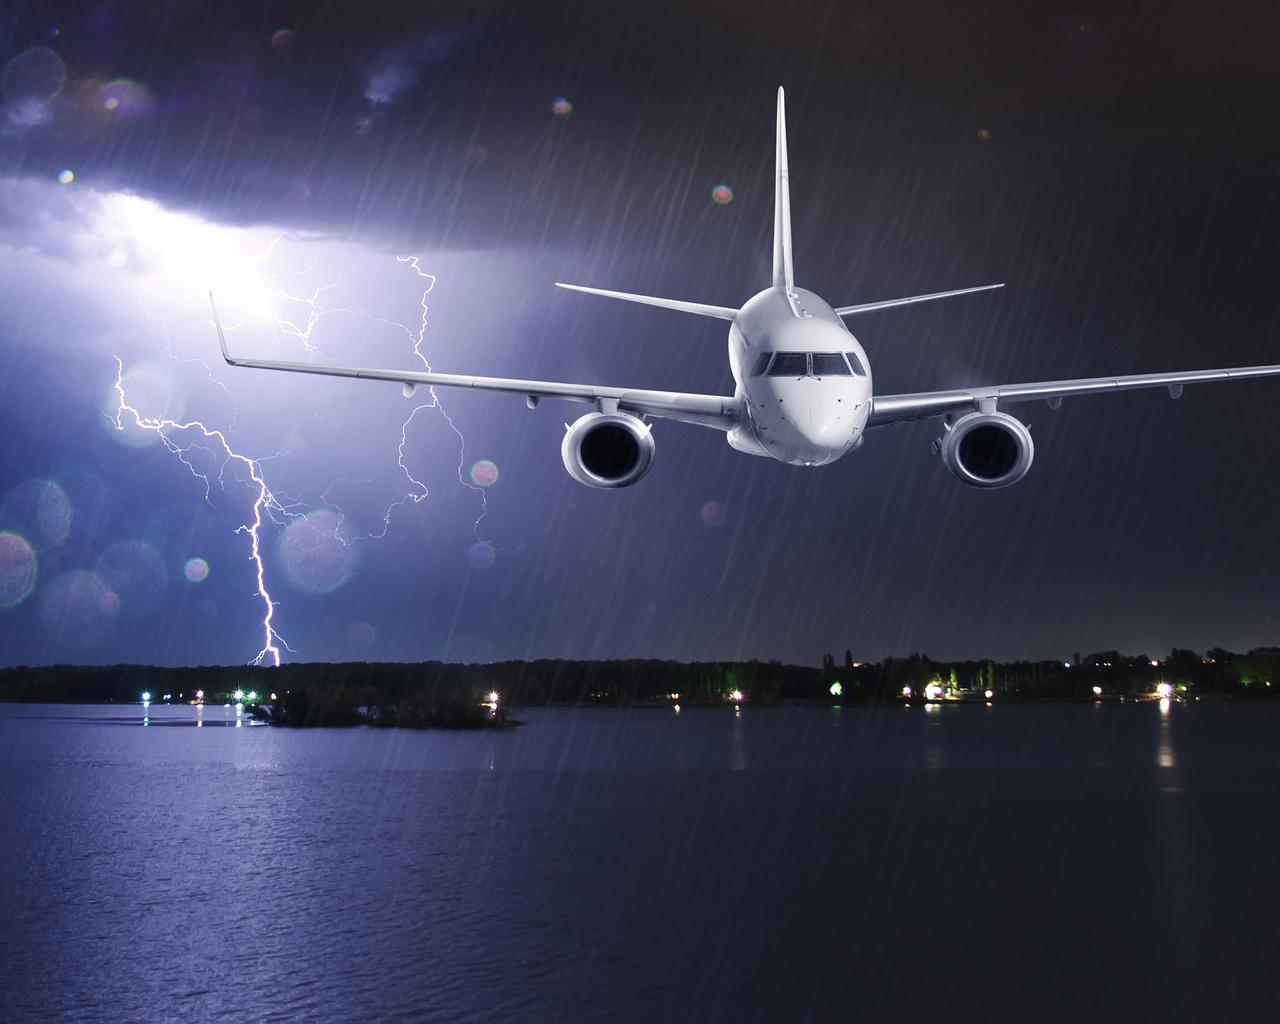 passenger, clouds, lightning, airplane, liner, shore, rain, lights, storm, sea, flight, night, glare